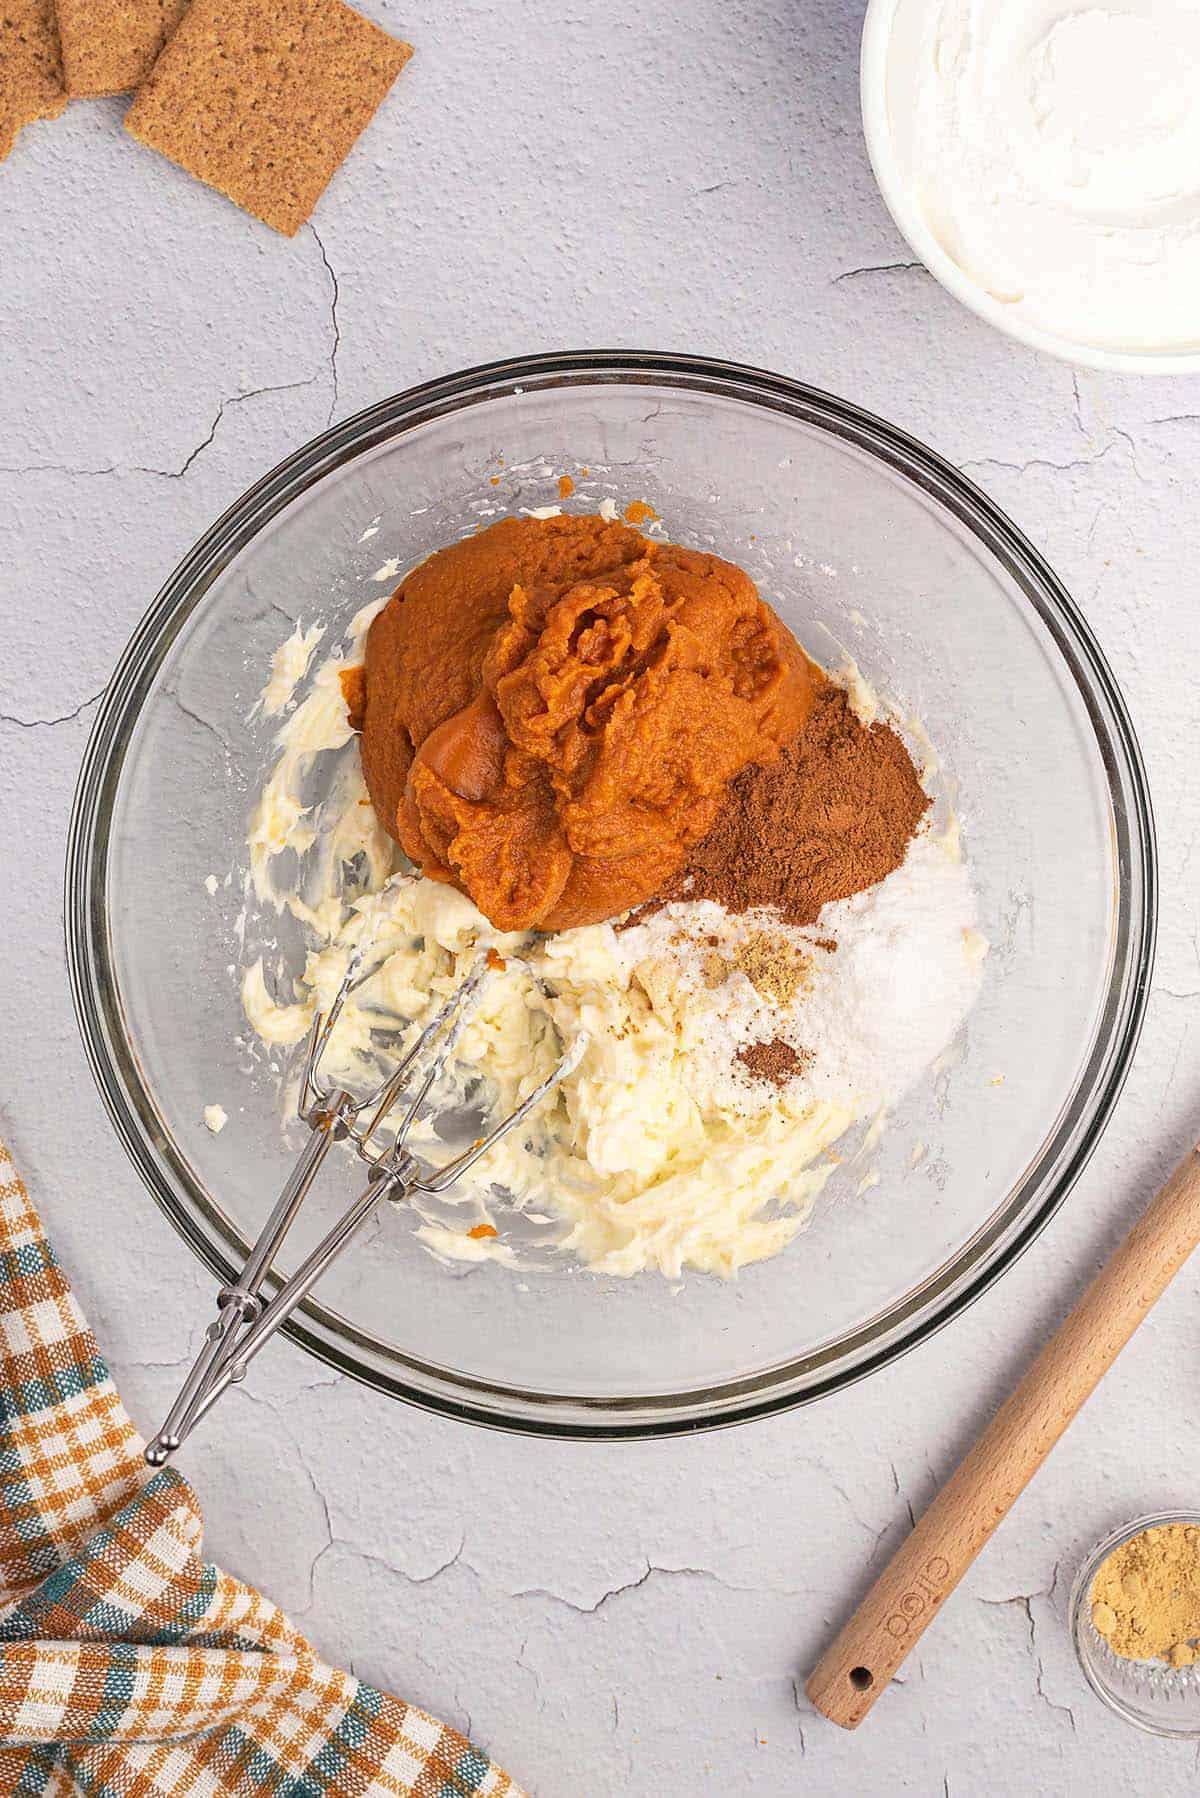 ingredients for pumpkin dip in glass bowl.